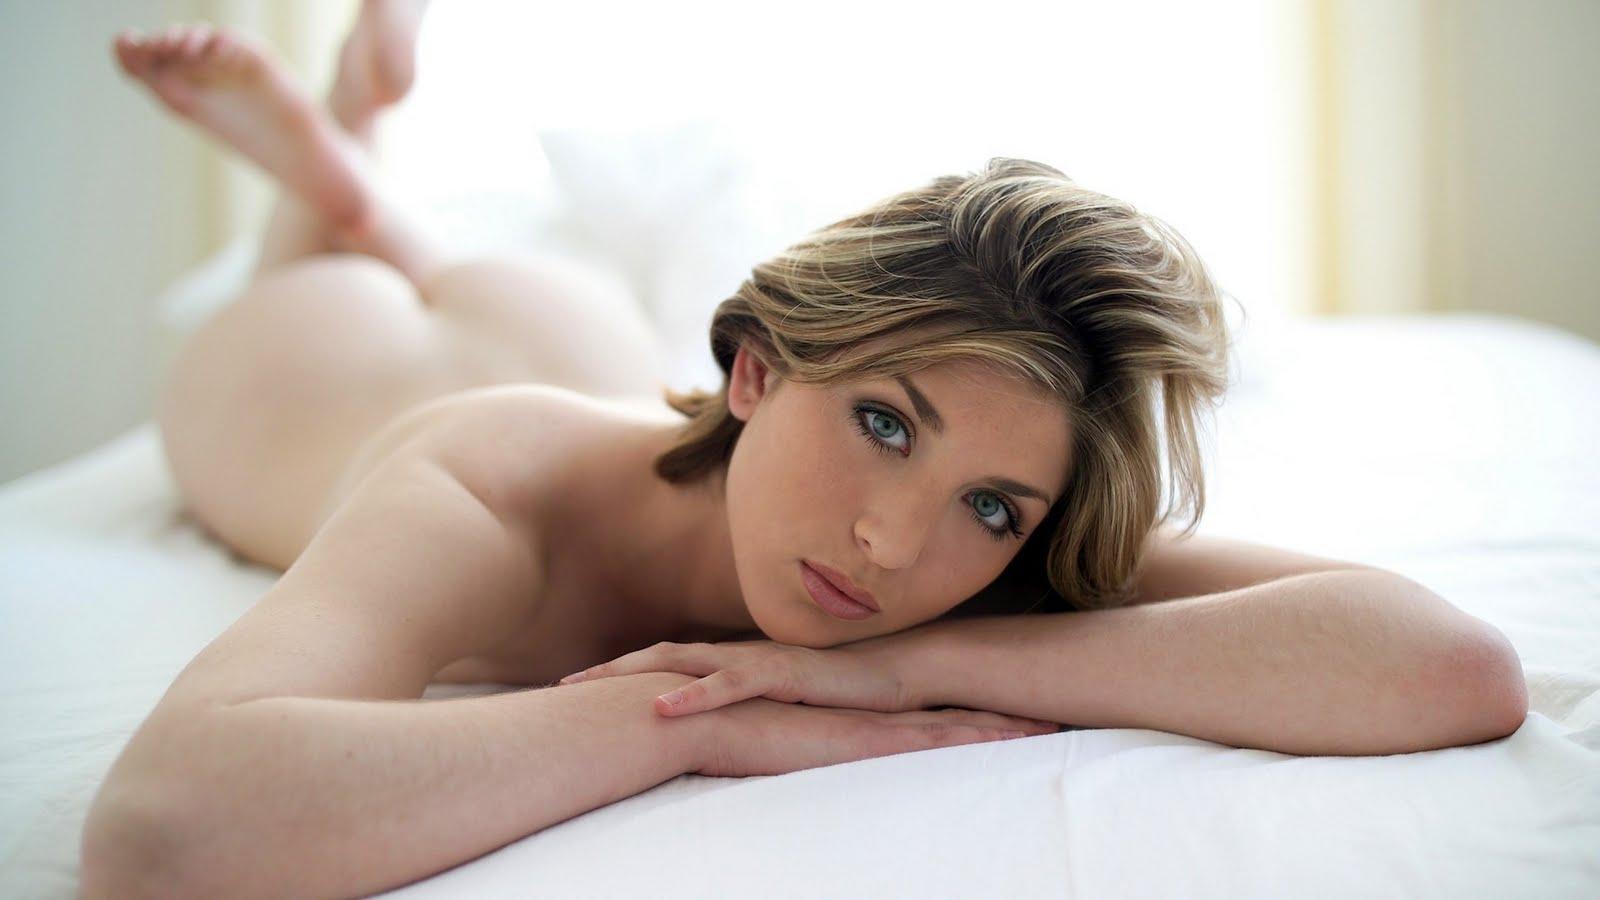 http://1.bp.blogspot.com/-L1wCPBMNxQU/TegihegUxLI/AAAAAAAAFUY/sD2DXGQvKDY/s1600/Wallpapers_Sexy_Girls_284_1+%252830%2529.jpg